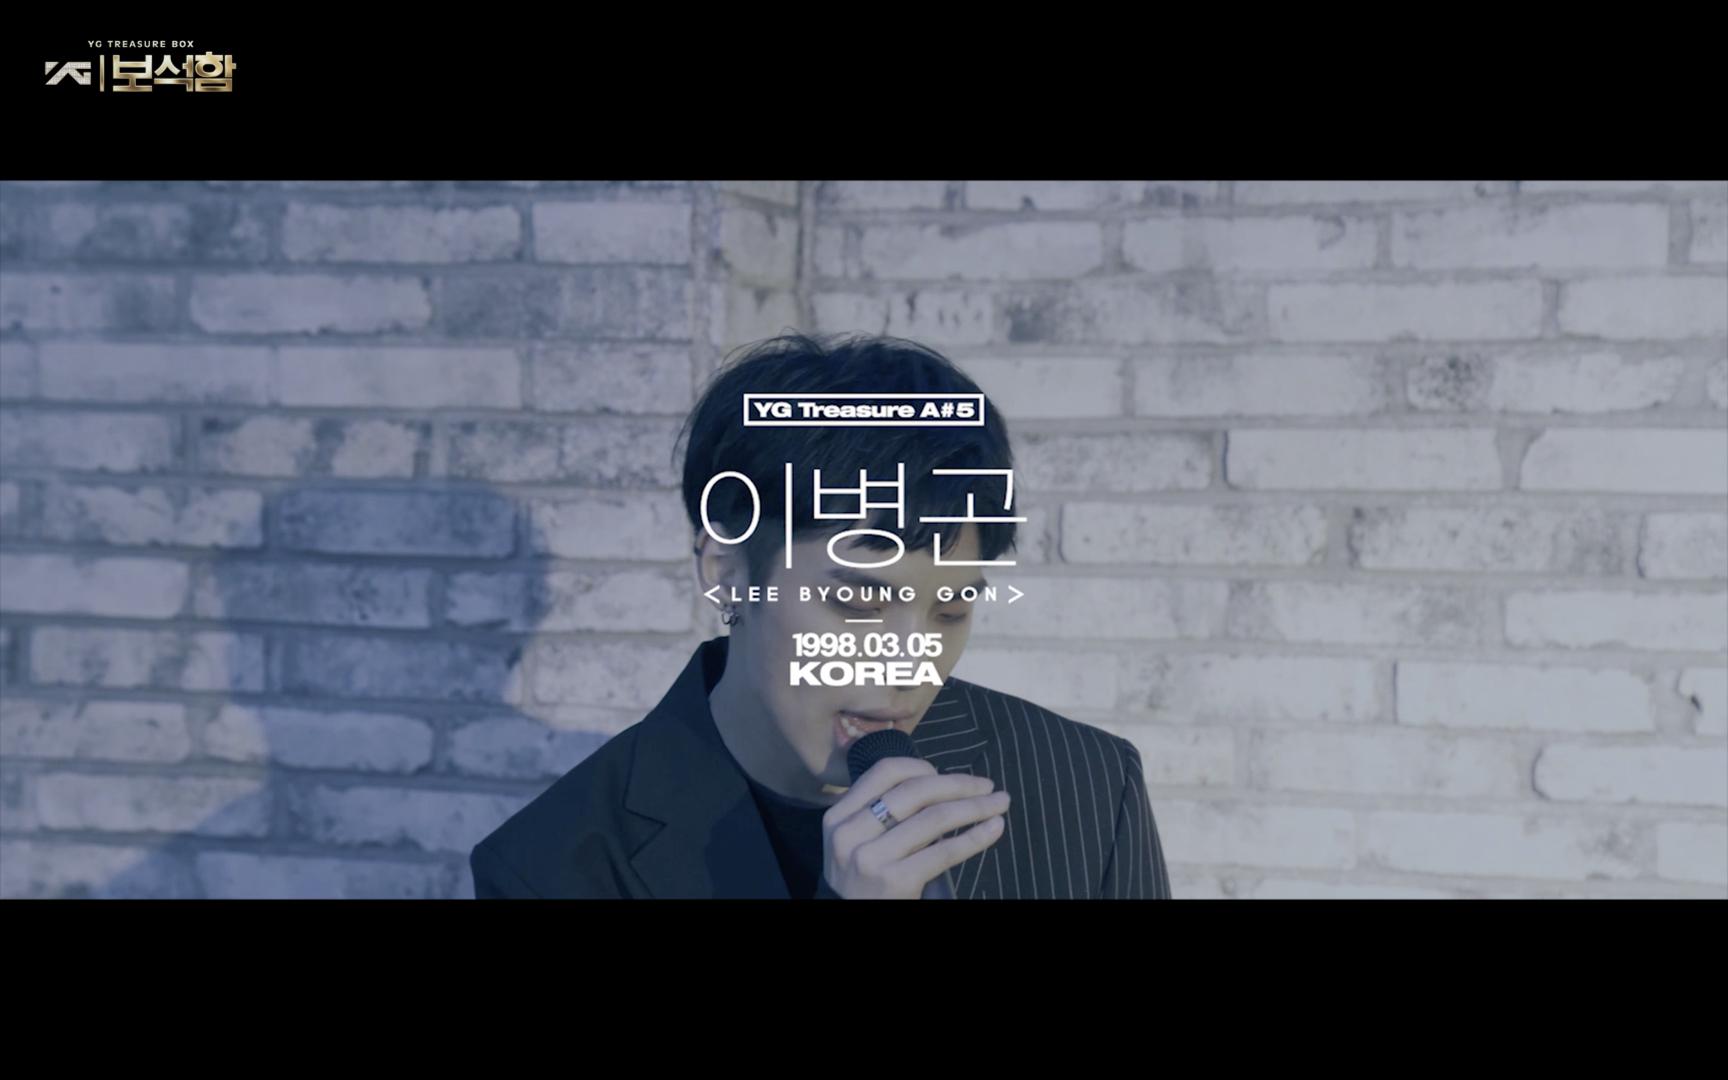 YG보석함ㅣ#인터뷰+퍼포먼스_TREASURE A#5 이병곤 <LEE BYOUNG GON>